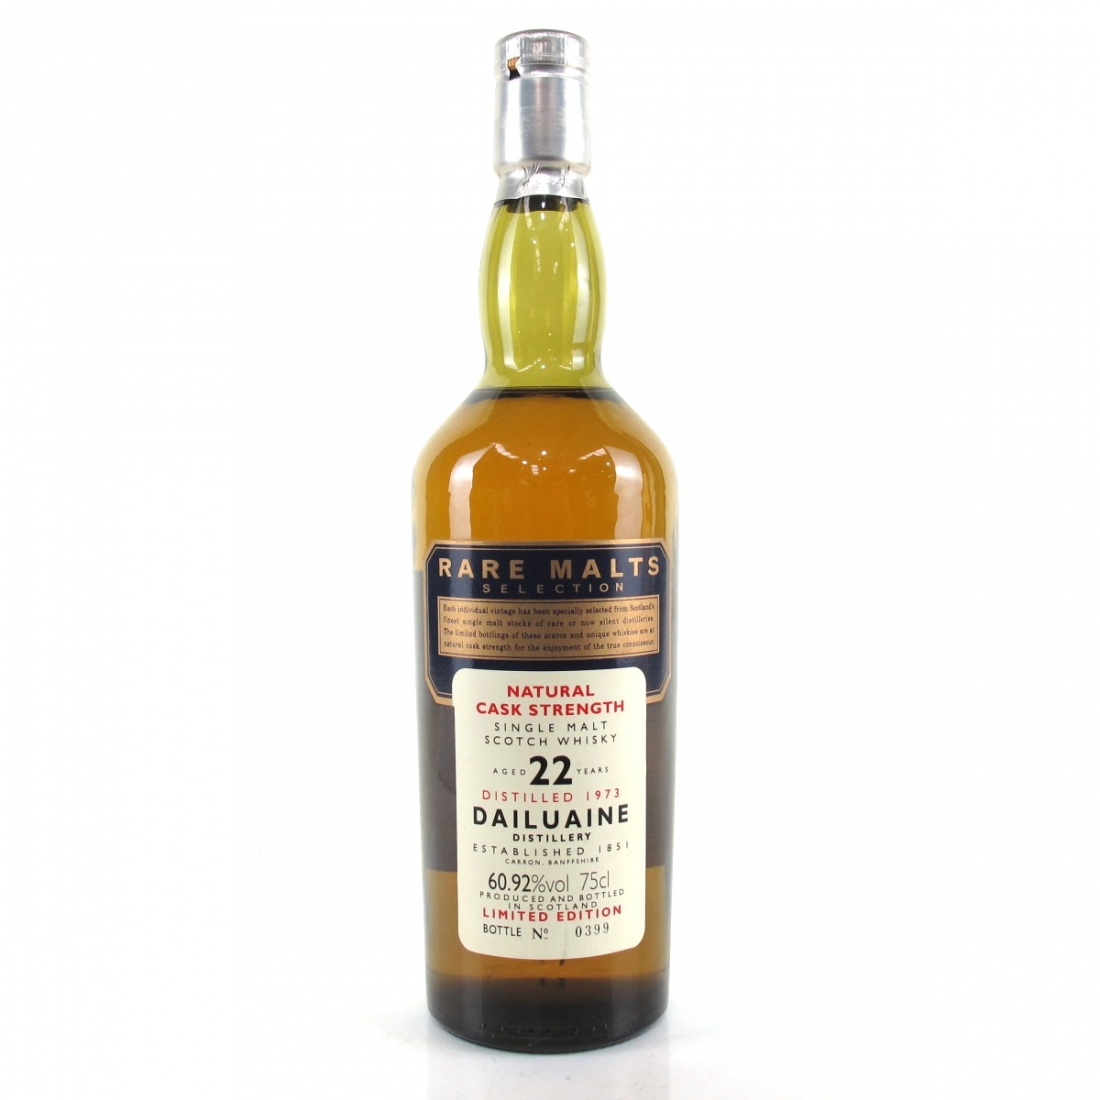 Dailuaine 1973 Rare Malt 22 Year Old 75cl / US Import 60.92%